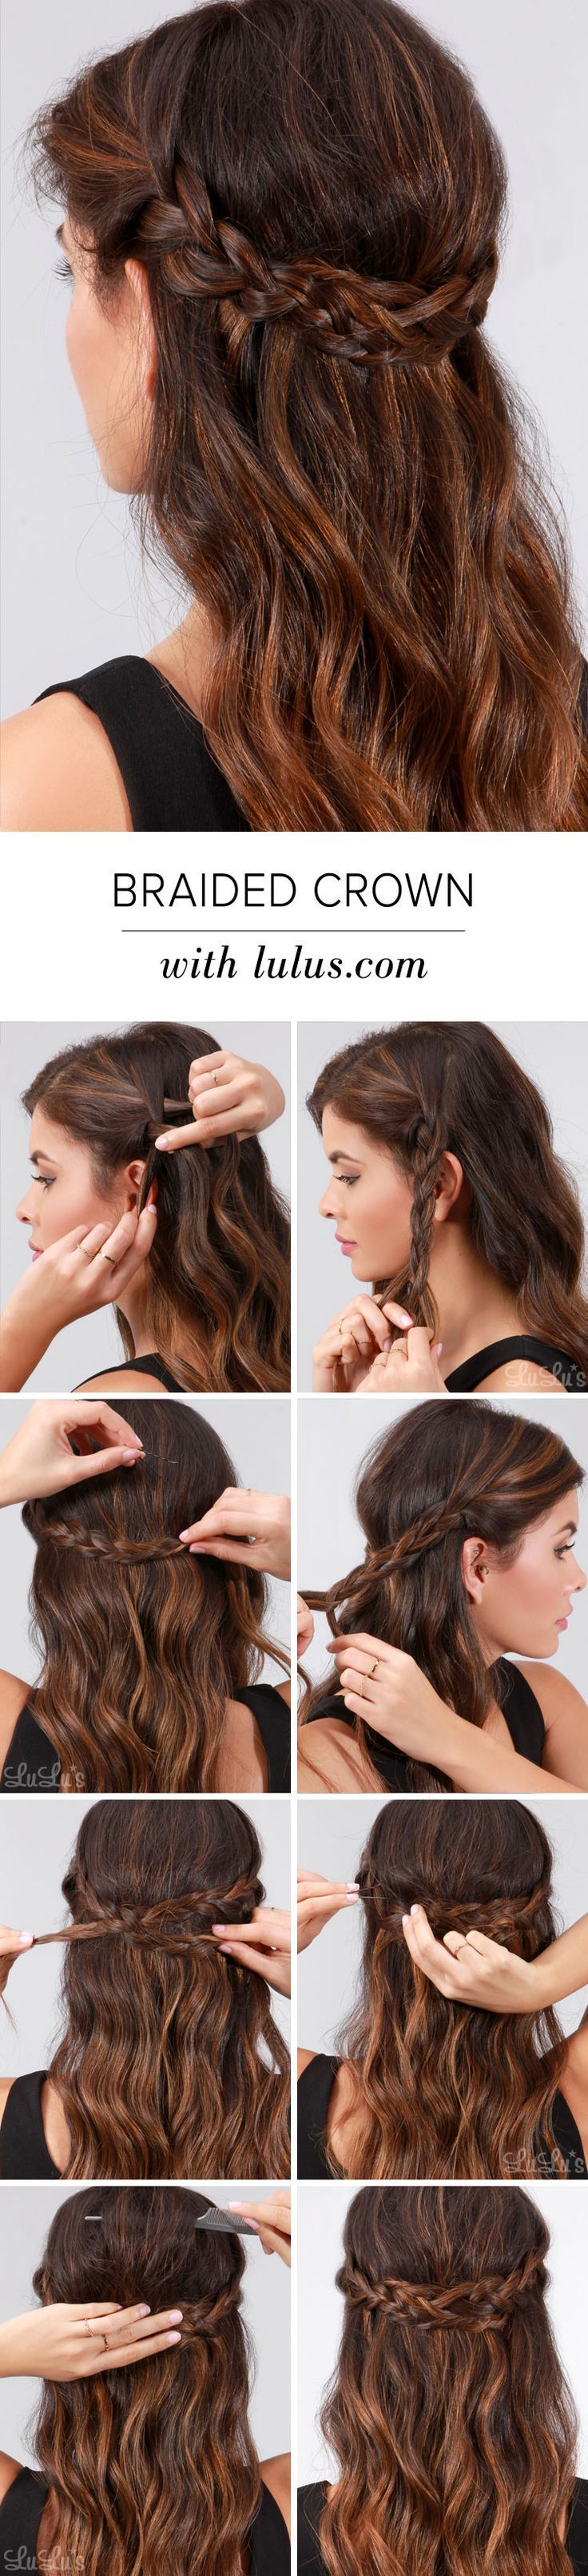 Super Easy Diy Braided Hairstyles For Wedding Tutorials Hair Styles Long Hair Styles Hair Tutorial